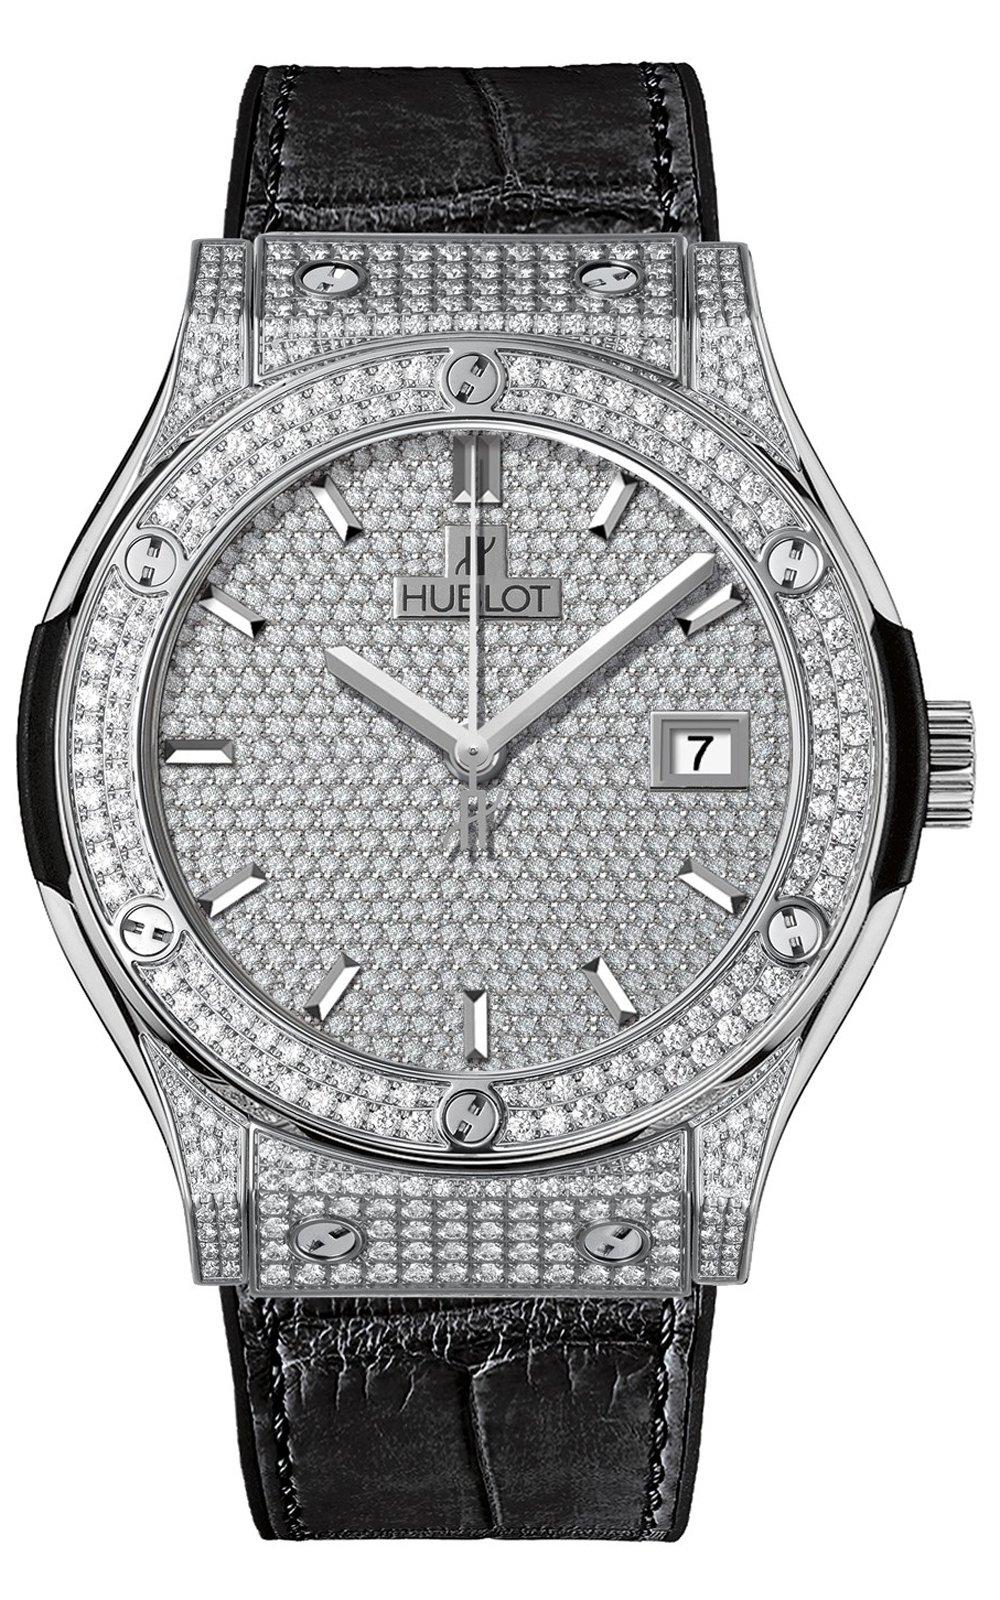 Classic Fusion Diamond Dial Black Leather Band Titanium Case Ladies Watch 581.NX.9010.LR.1704, 33mm